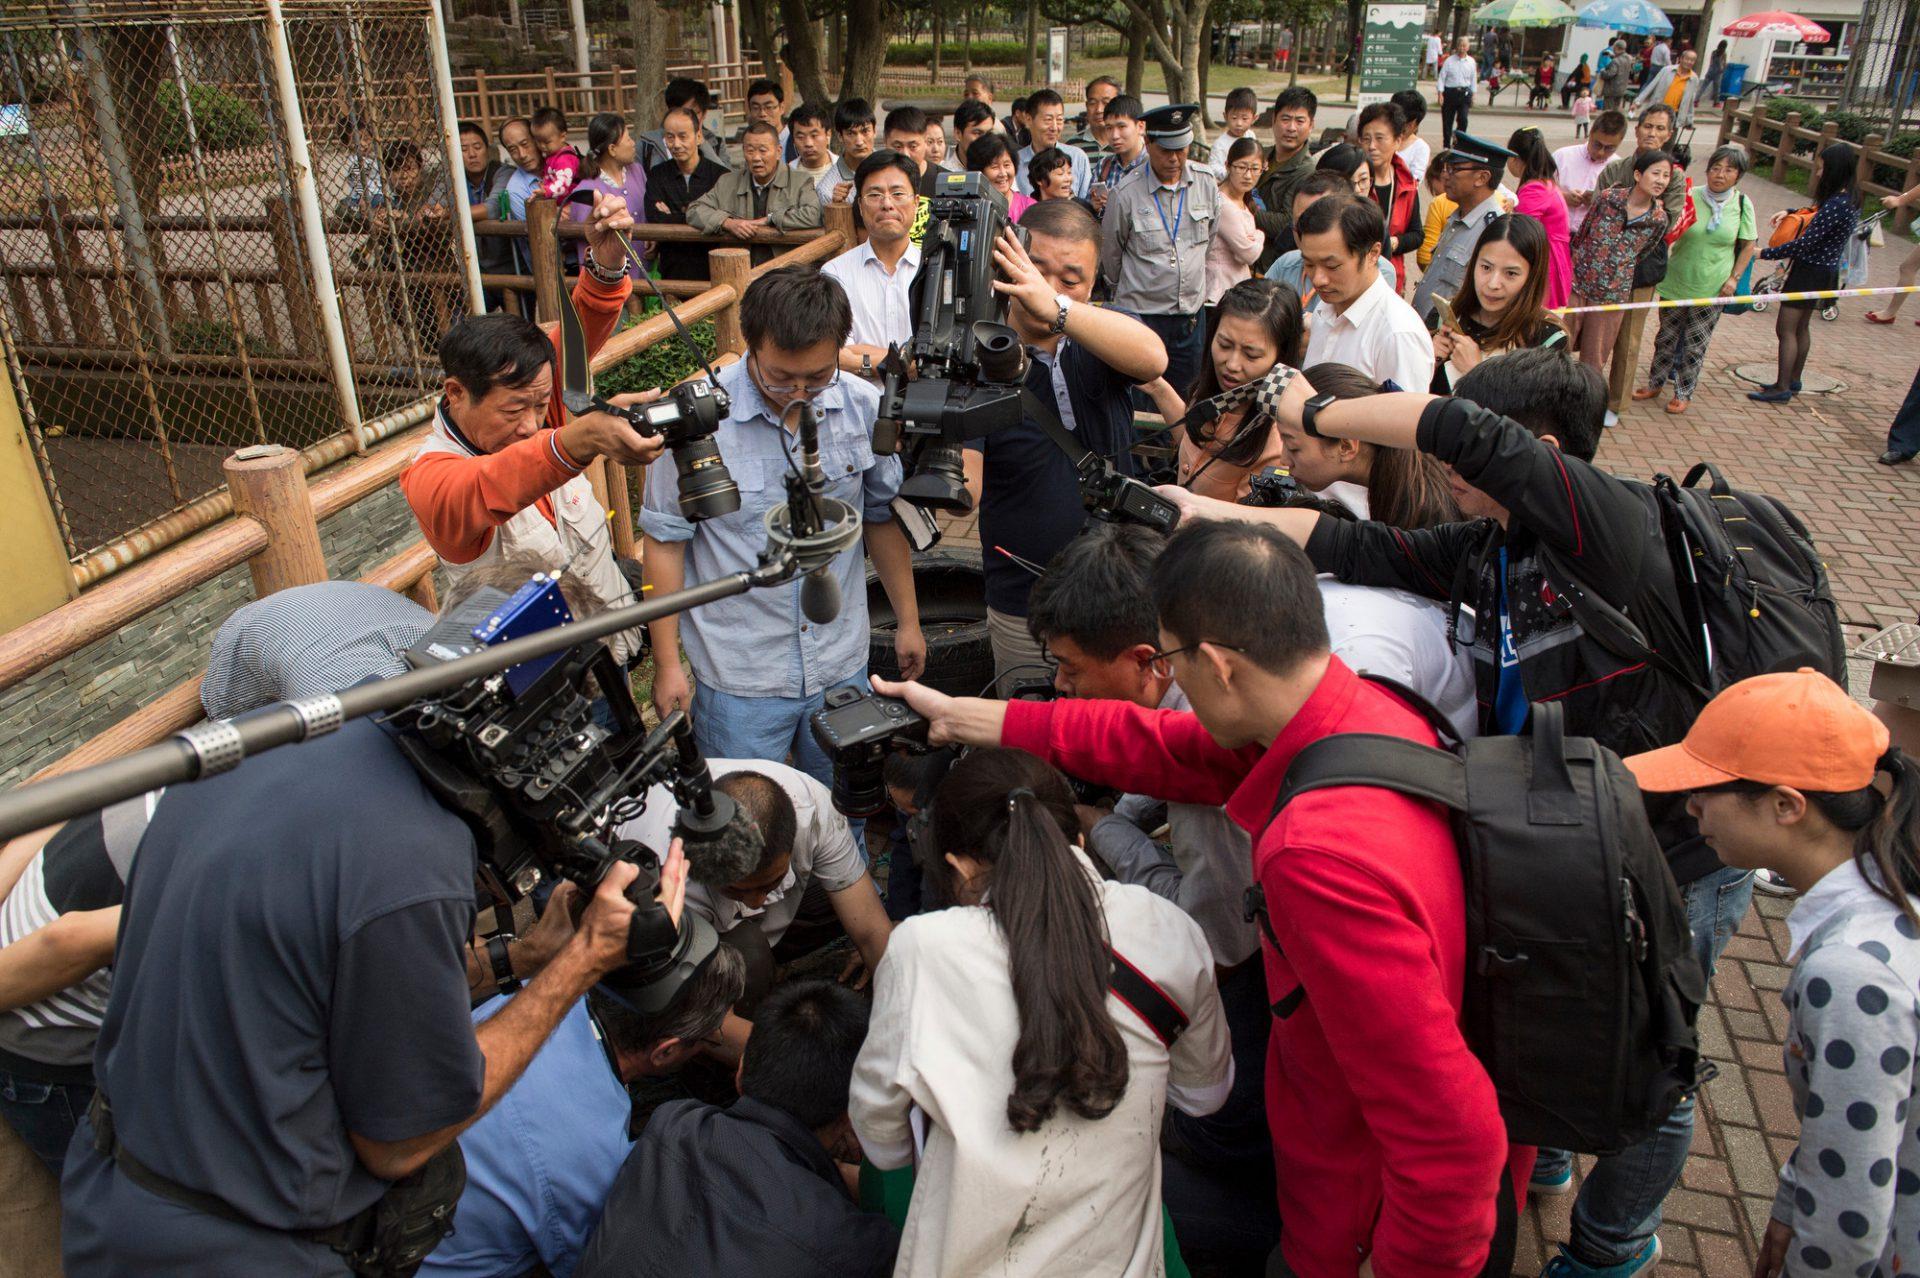 Photo: Media crowds around a critically endangered Yangtze giant softshell turtle (Rafetus swinhoei) at the Suzhou Zoo in China.